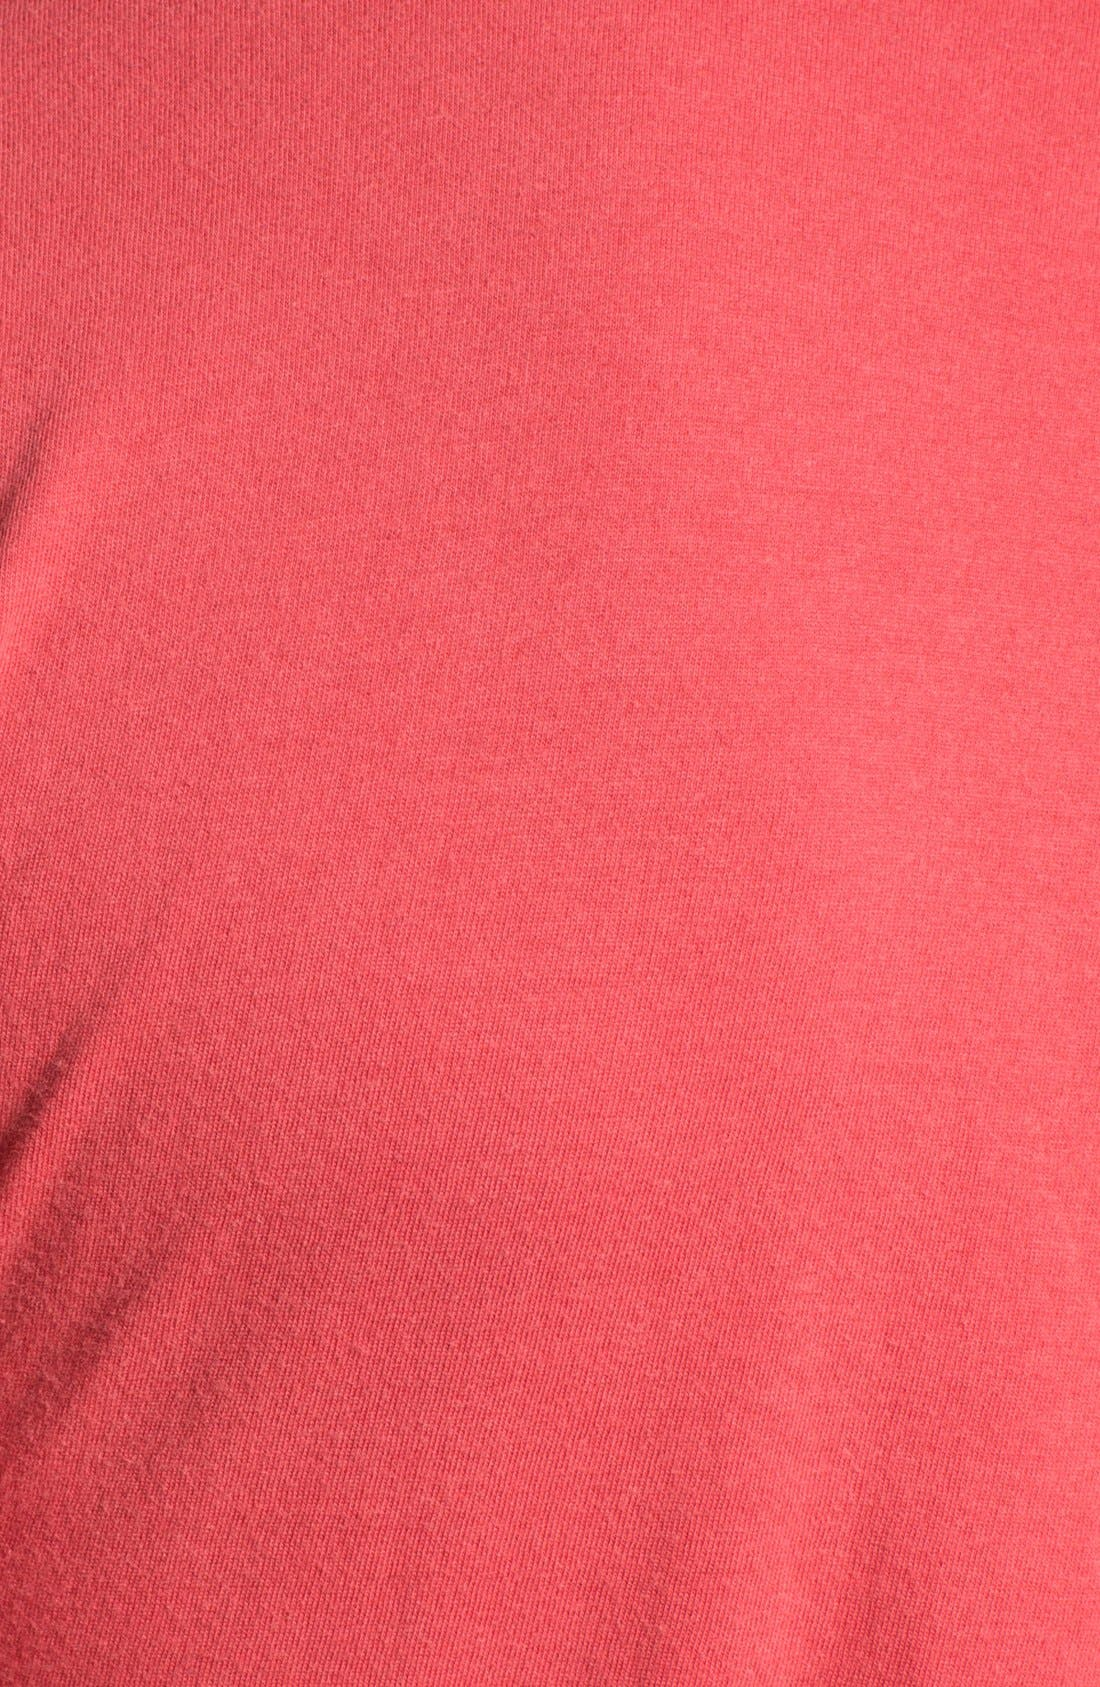 'Texas Rangers' T-Shirt,                             Alternate thumbnail 3, color,